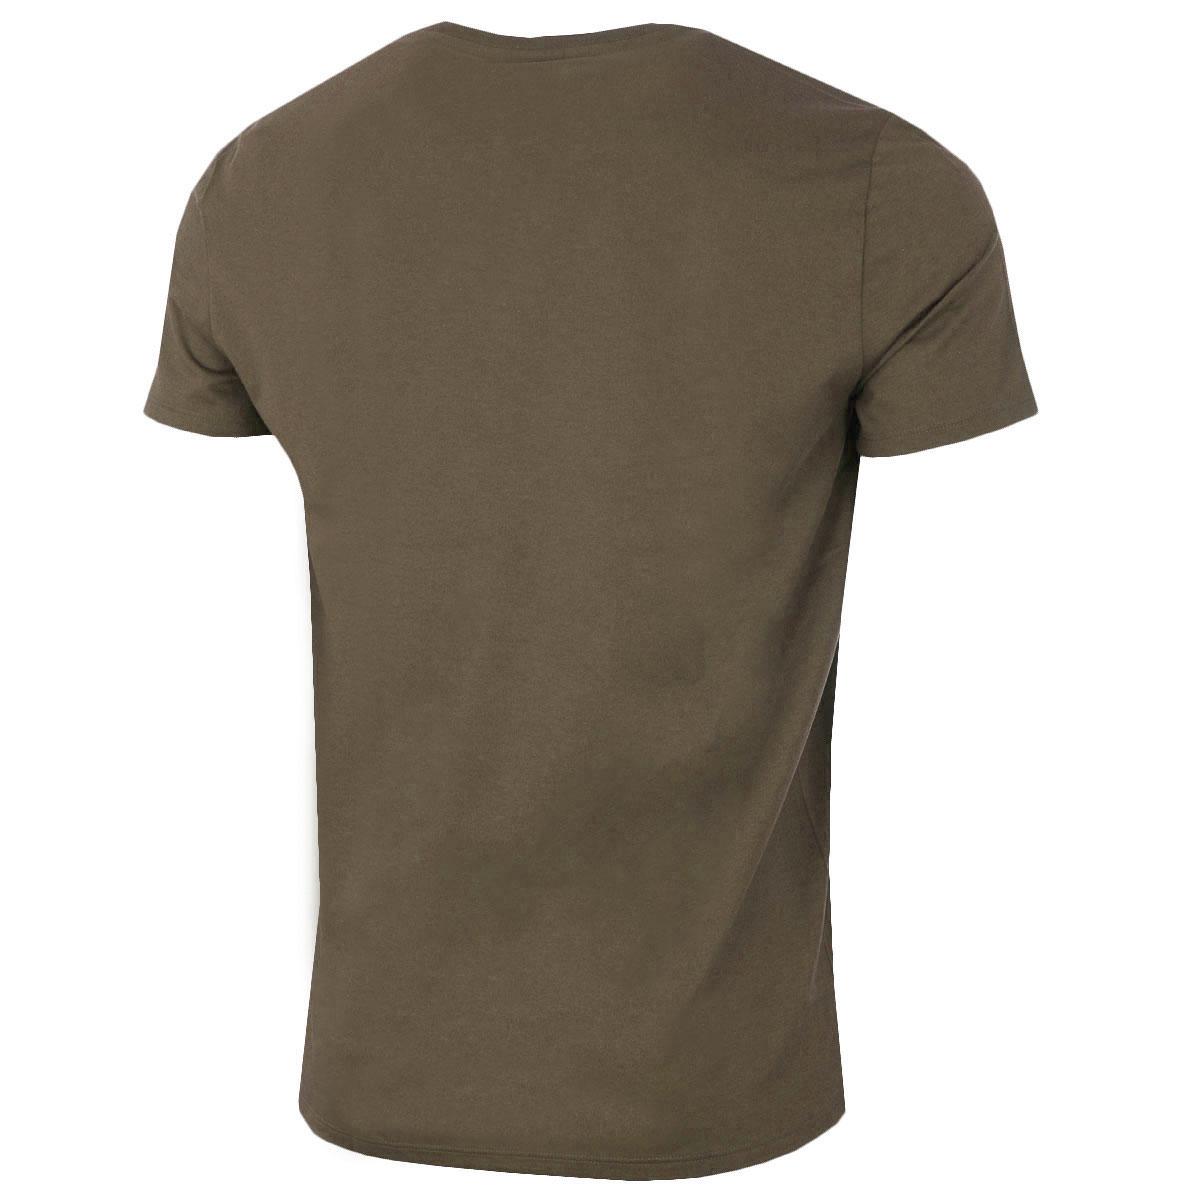 08653753b70f Lacoste Mens SS V-Neck T Shirt TH6710 Short Sleeve Pima Cotton 32 ...